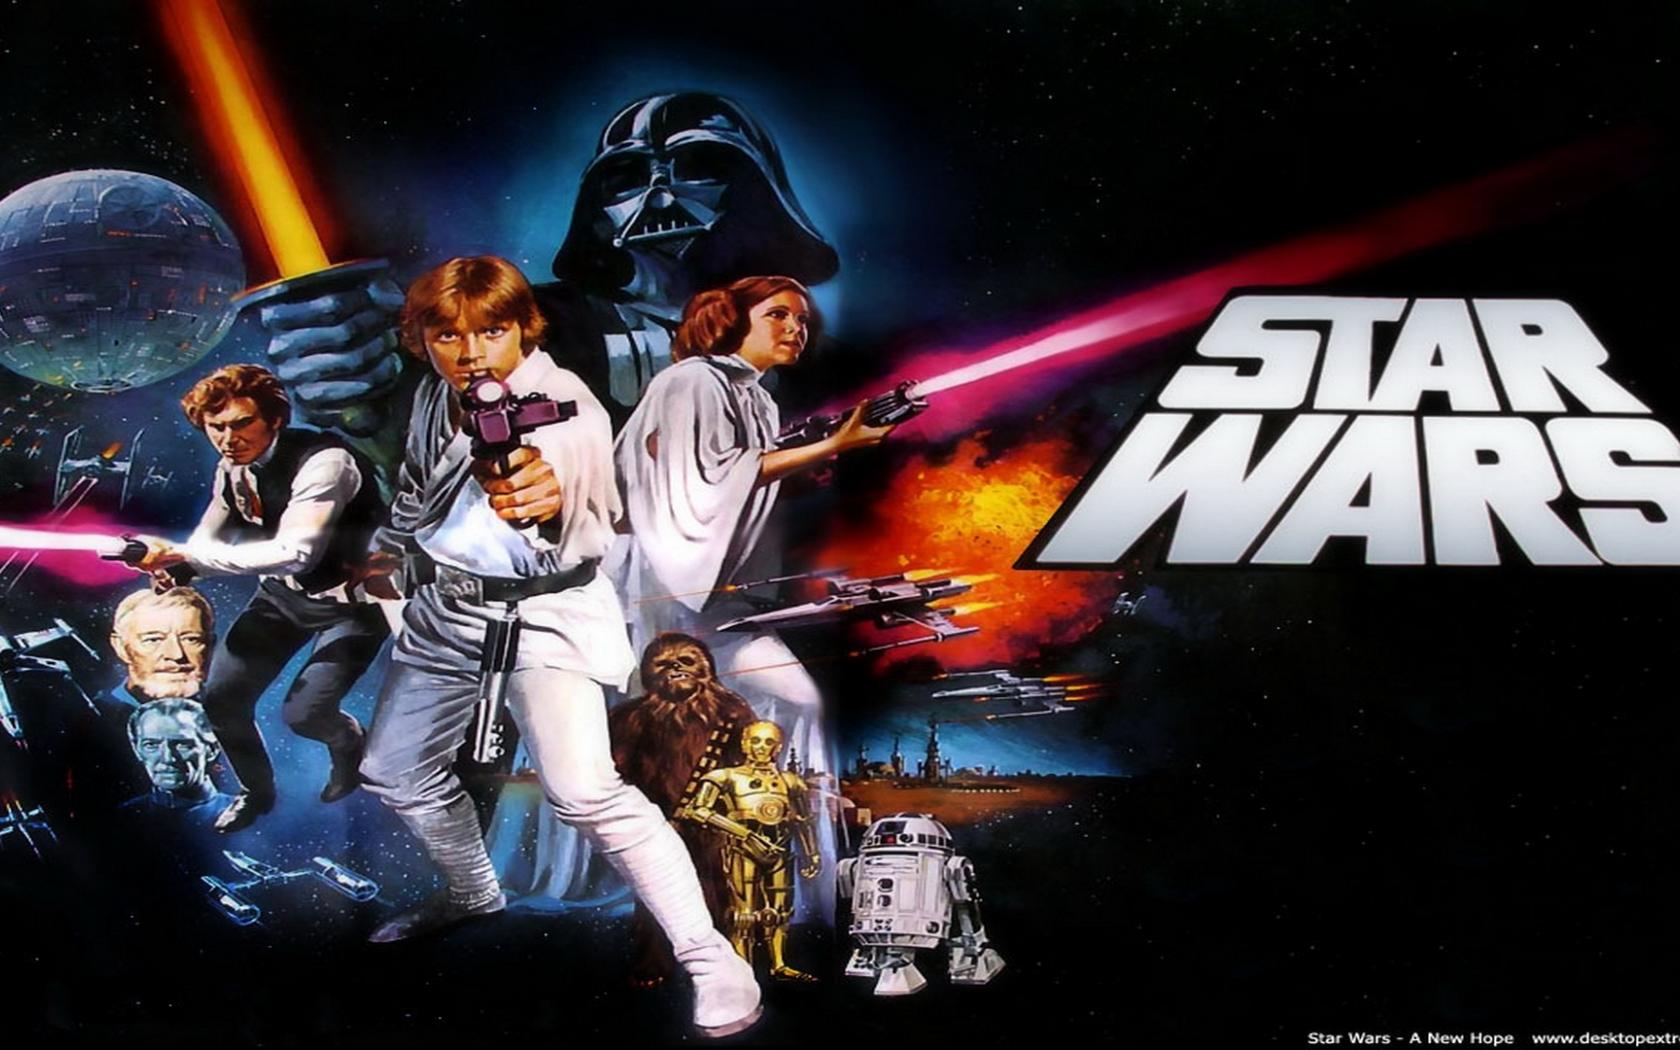 Star Wars Live Wallpaper For Pc Star Wars Wallpaper Star Wars Background Original 2927182 Hd Wallpaper Backgrounds Download